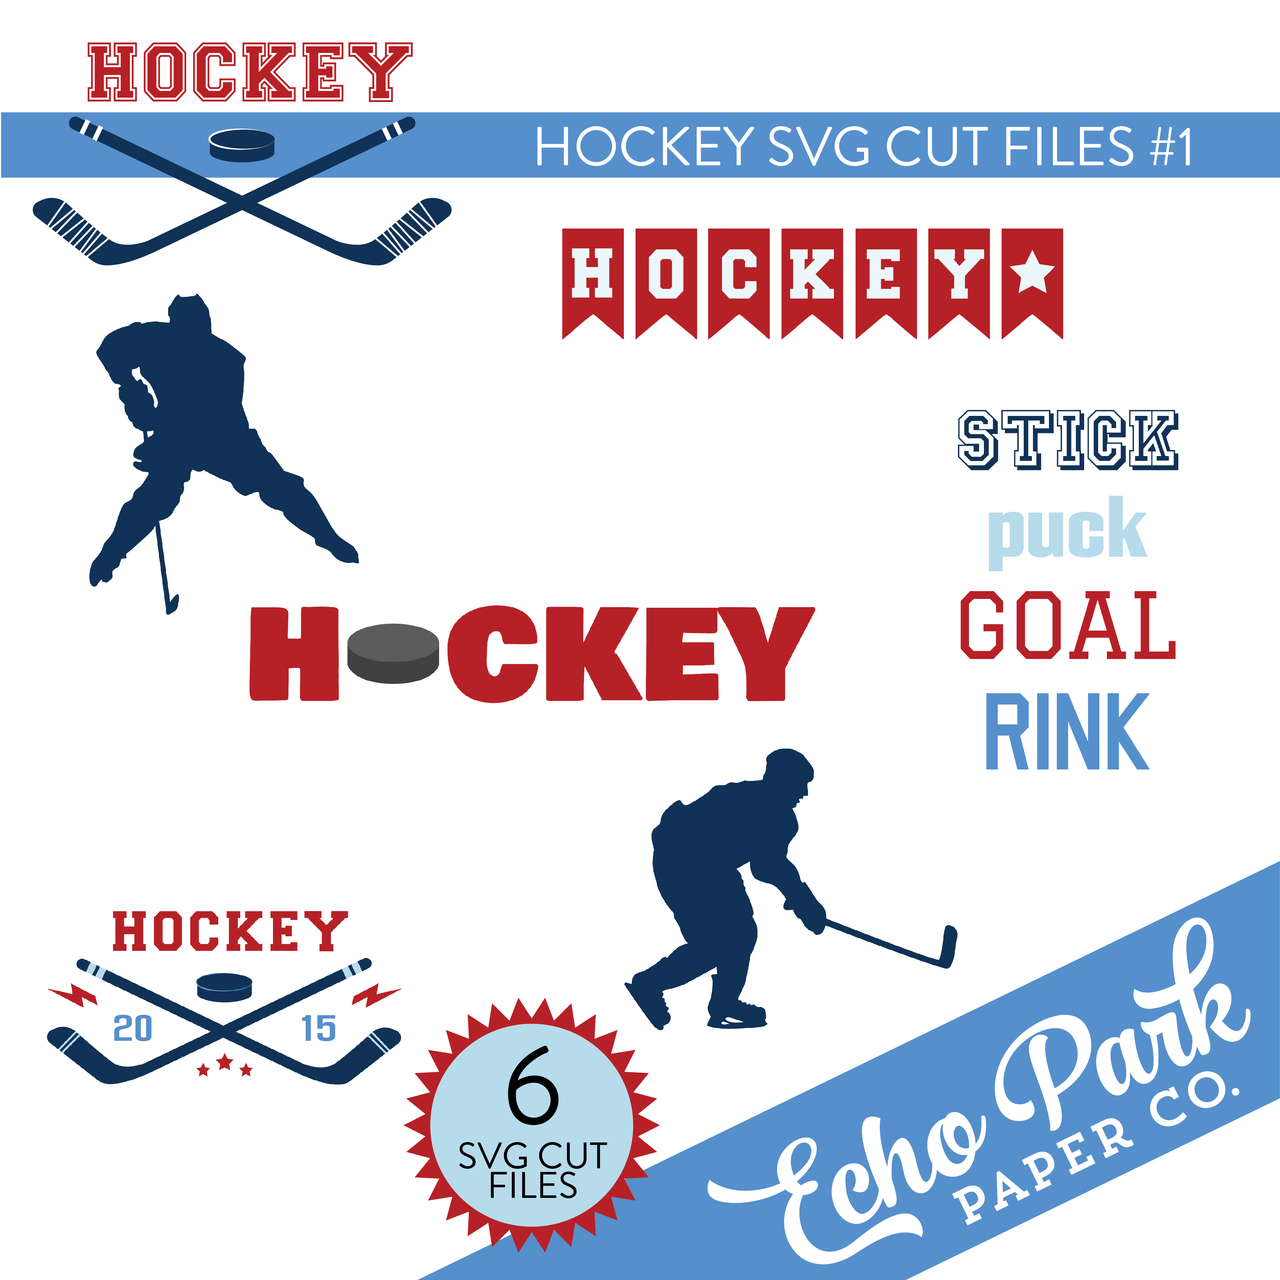 Hockey SVG Cut Files #1